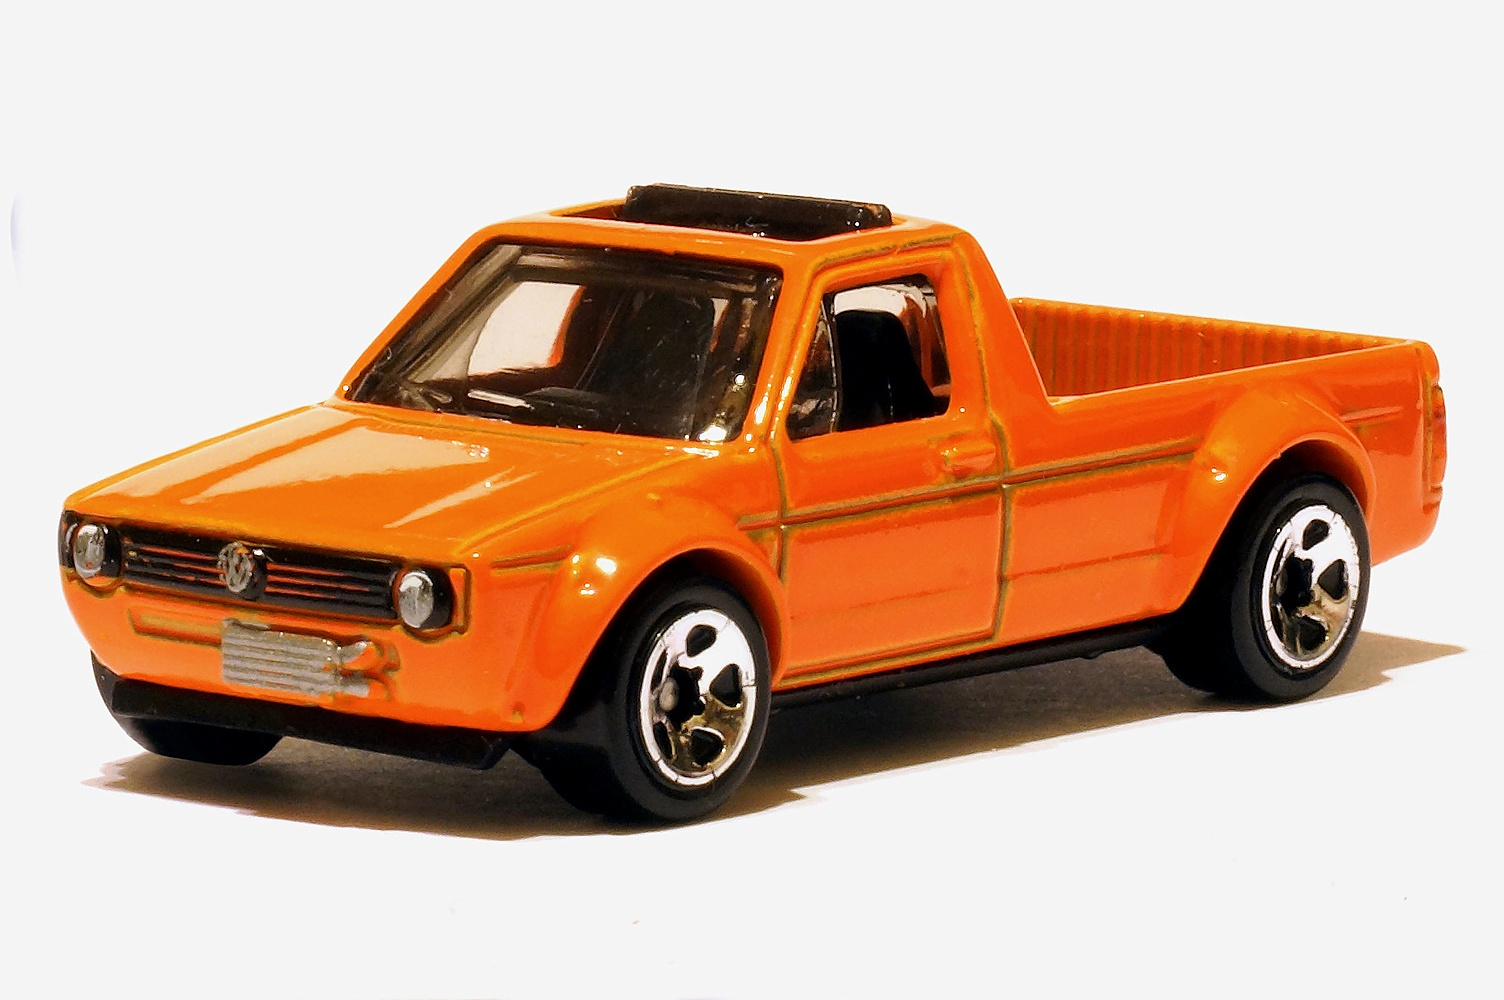 volkswagen caddy hot wheels wiki fandom powered by wikia. Black Bedroom Furniture Sets. Home Design Ideas